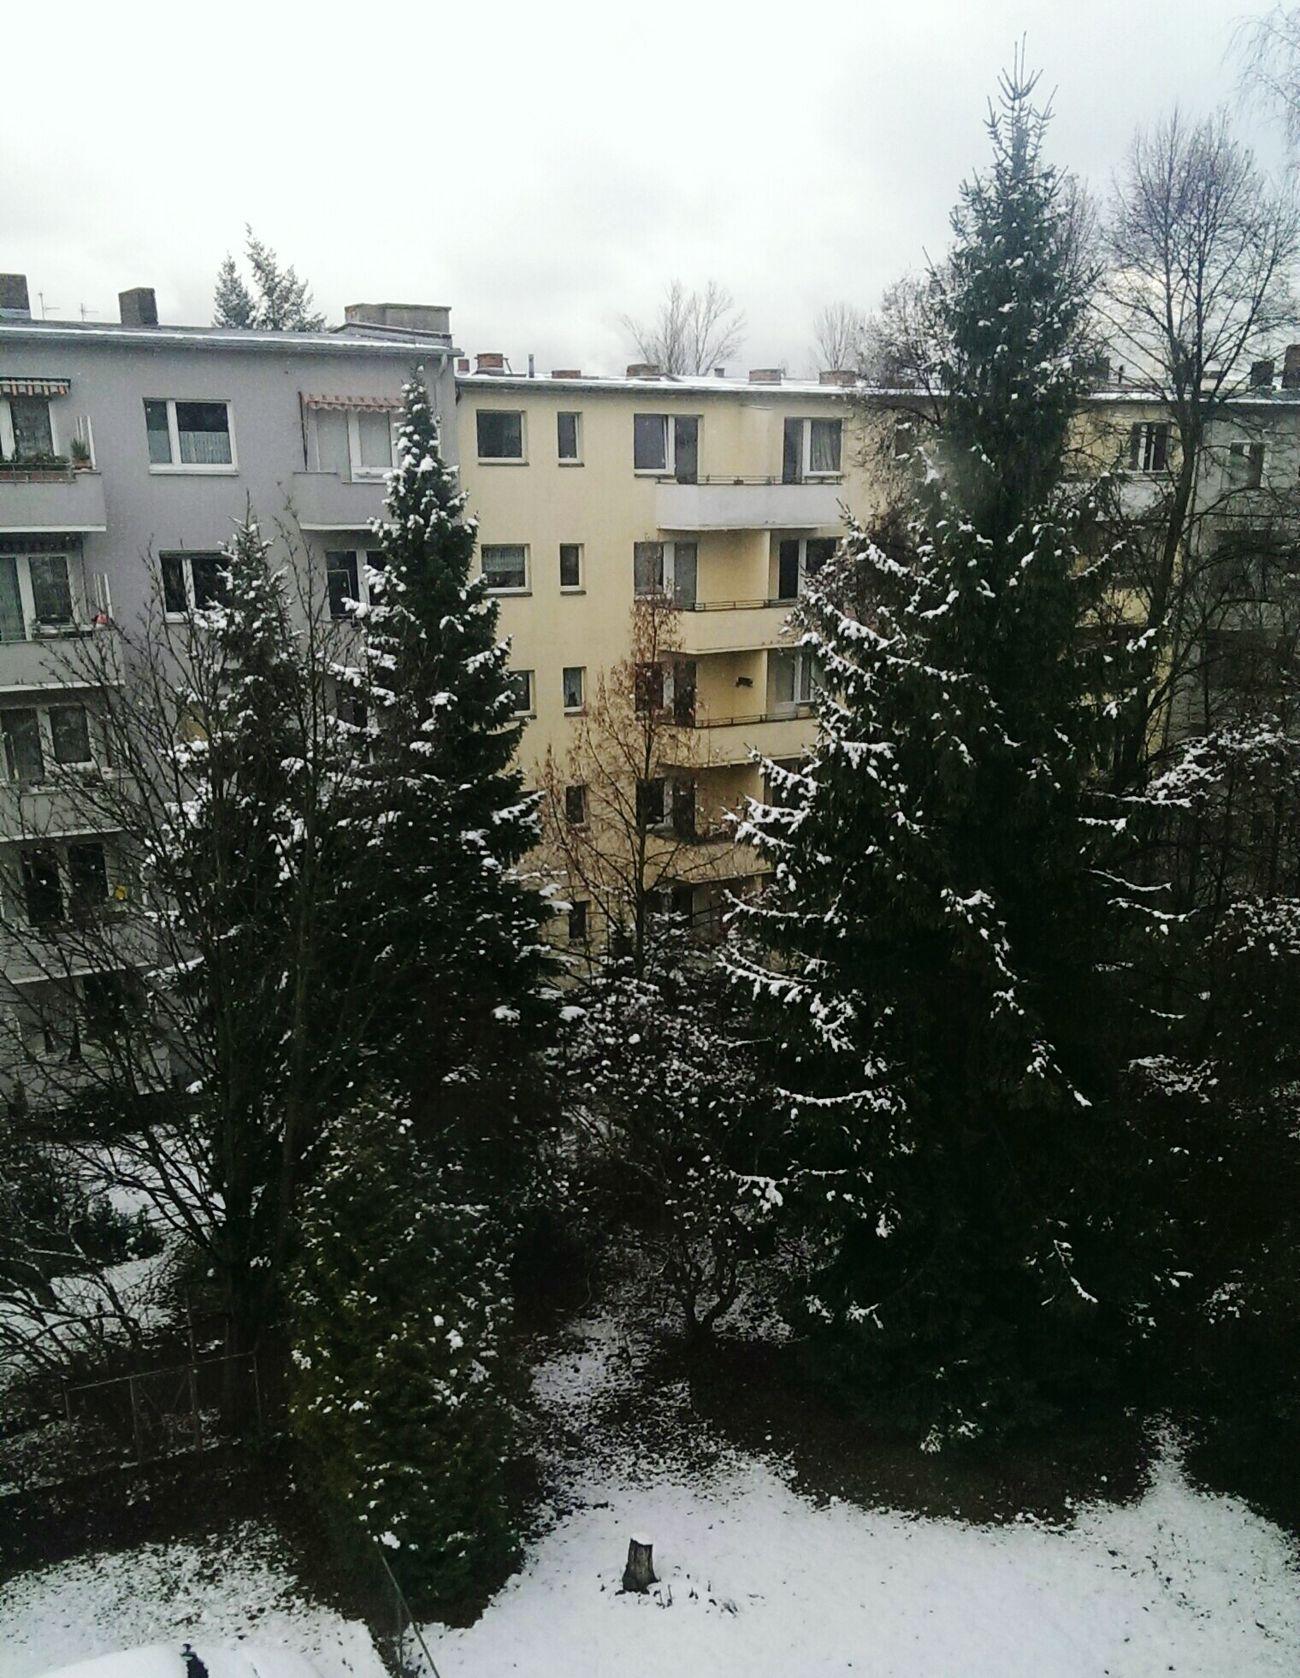 Schneeflöckchen, Weissröckchen... ?❄⛄ Merrychristmas❄️ Snow ❄ Xmas Tree Happy Holidays!